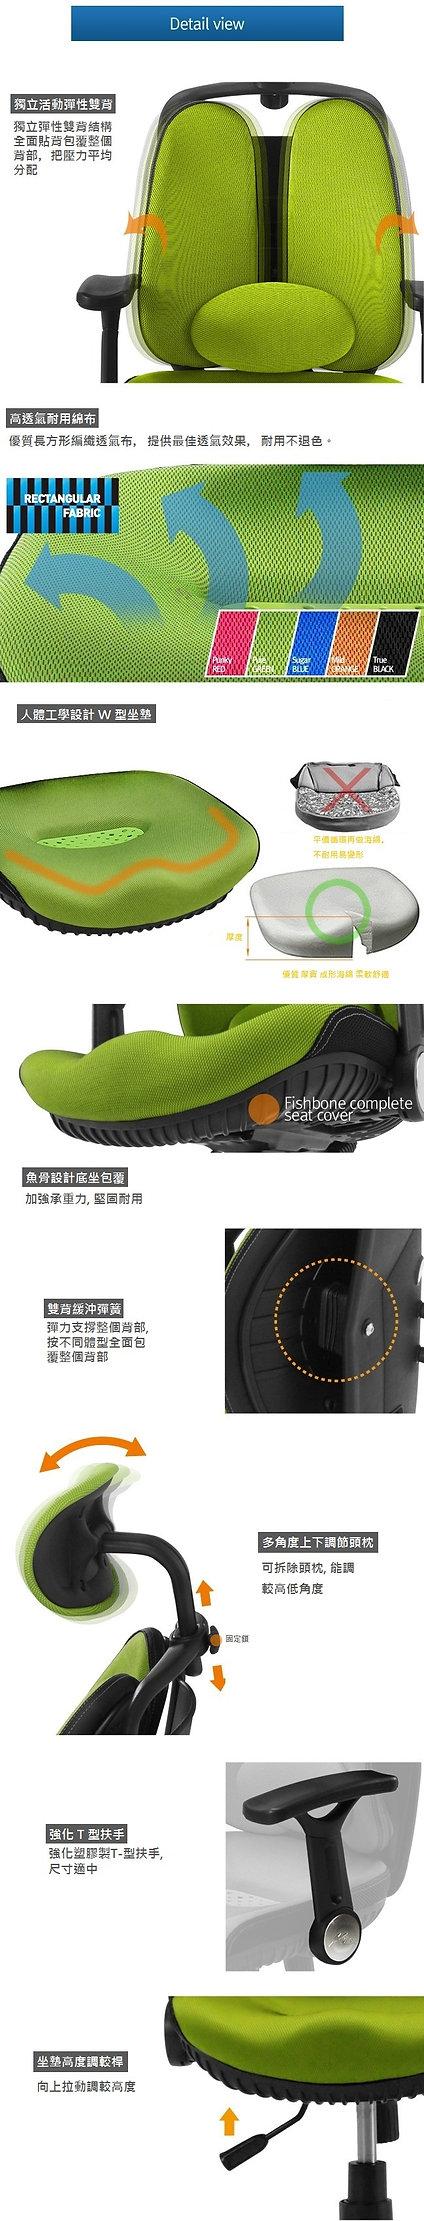 innodescr_Chinese.jpg